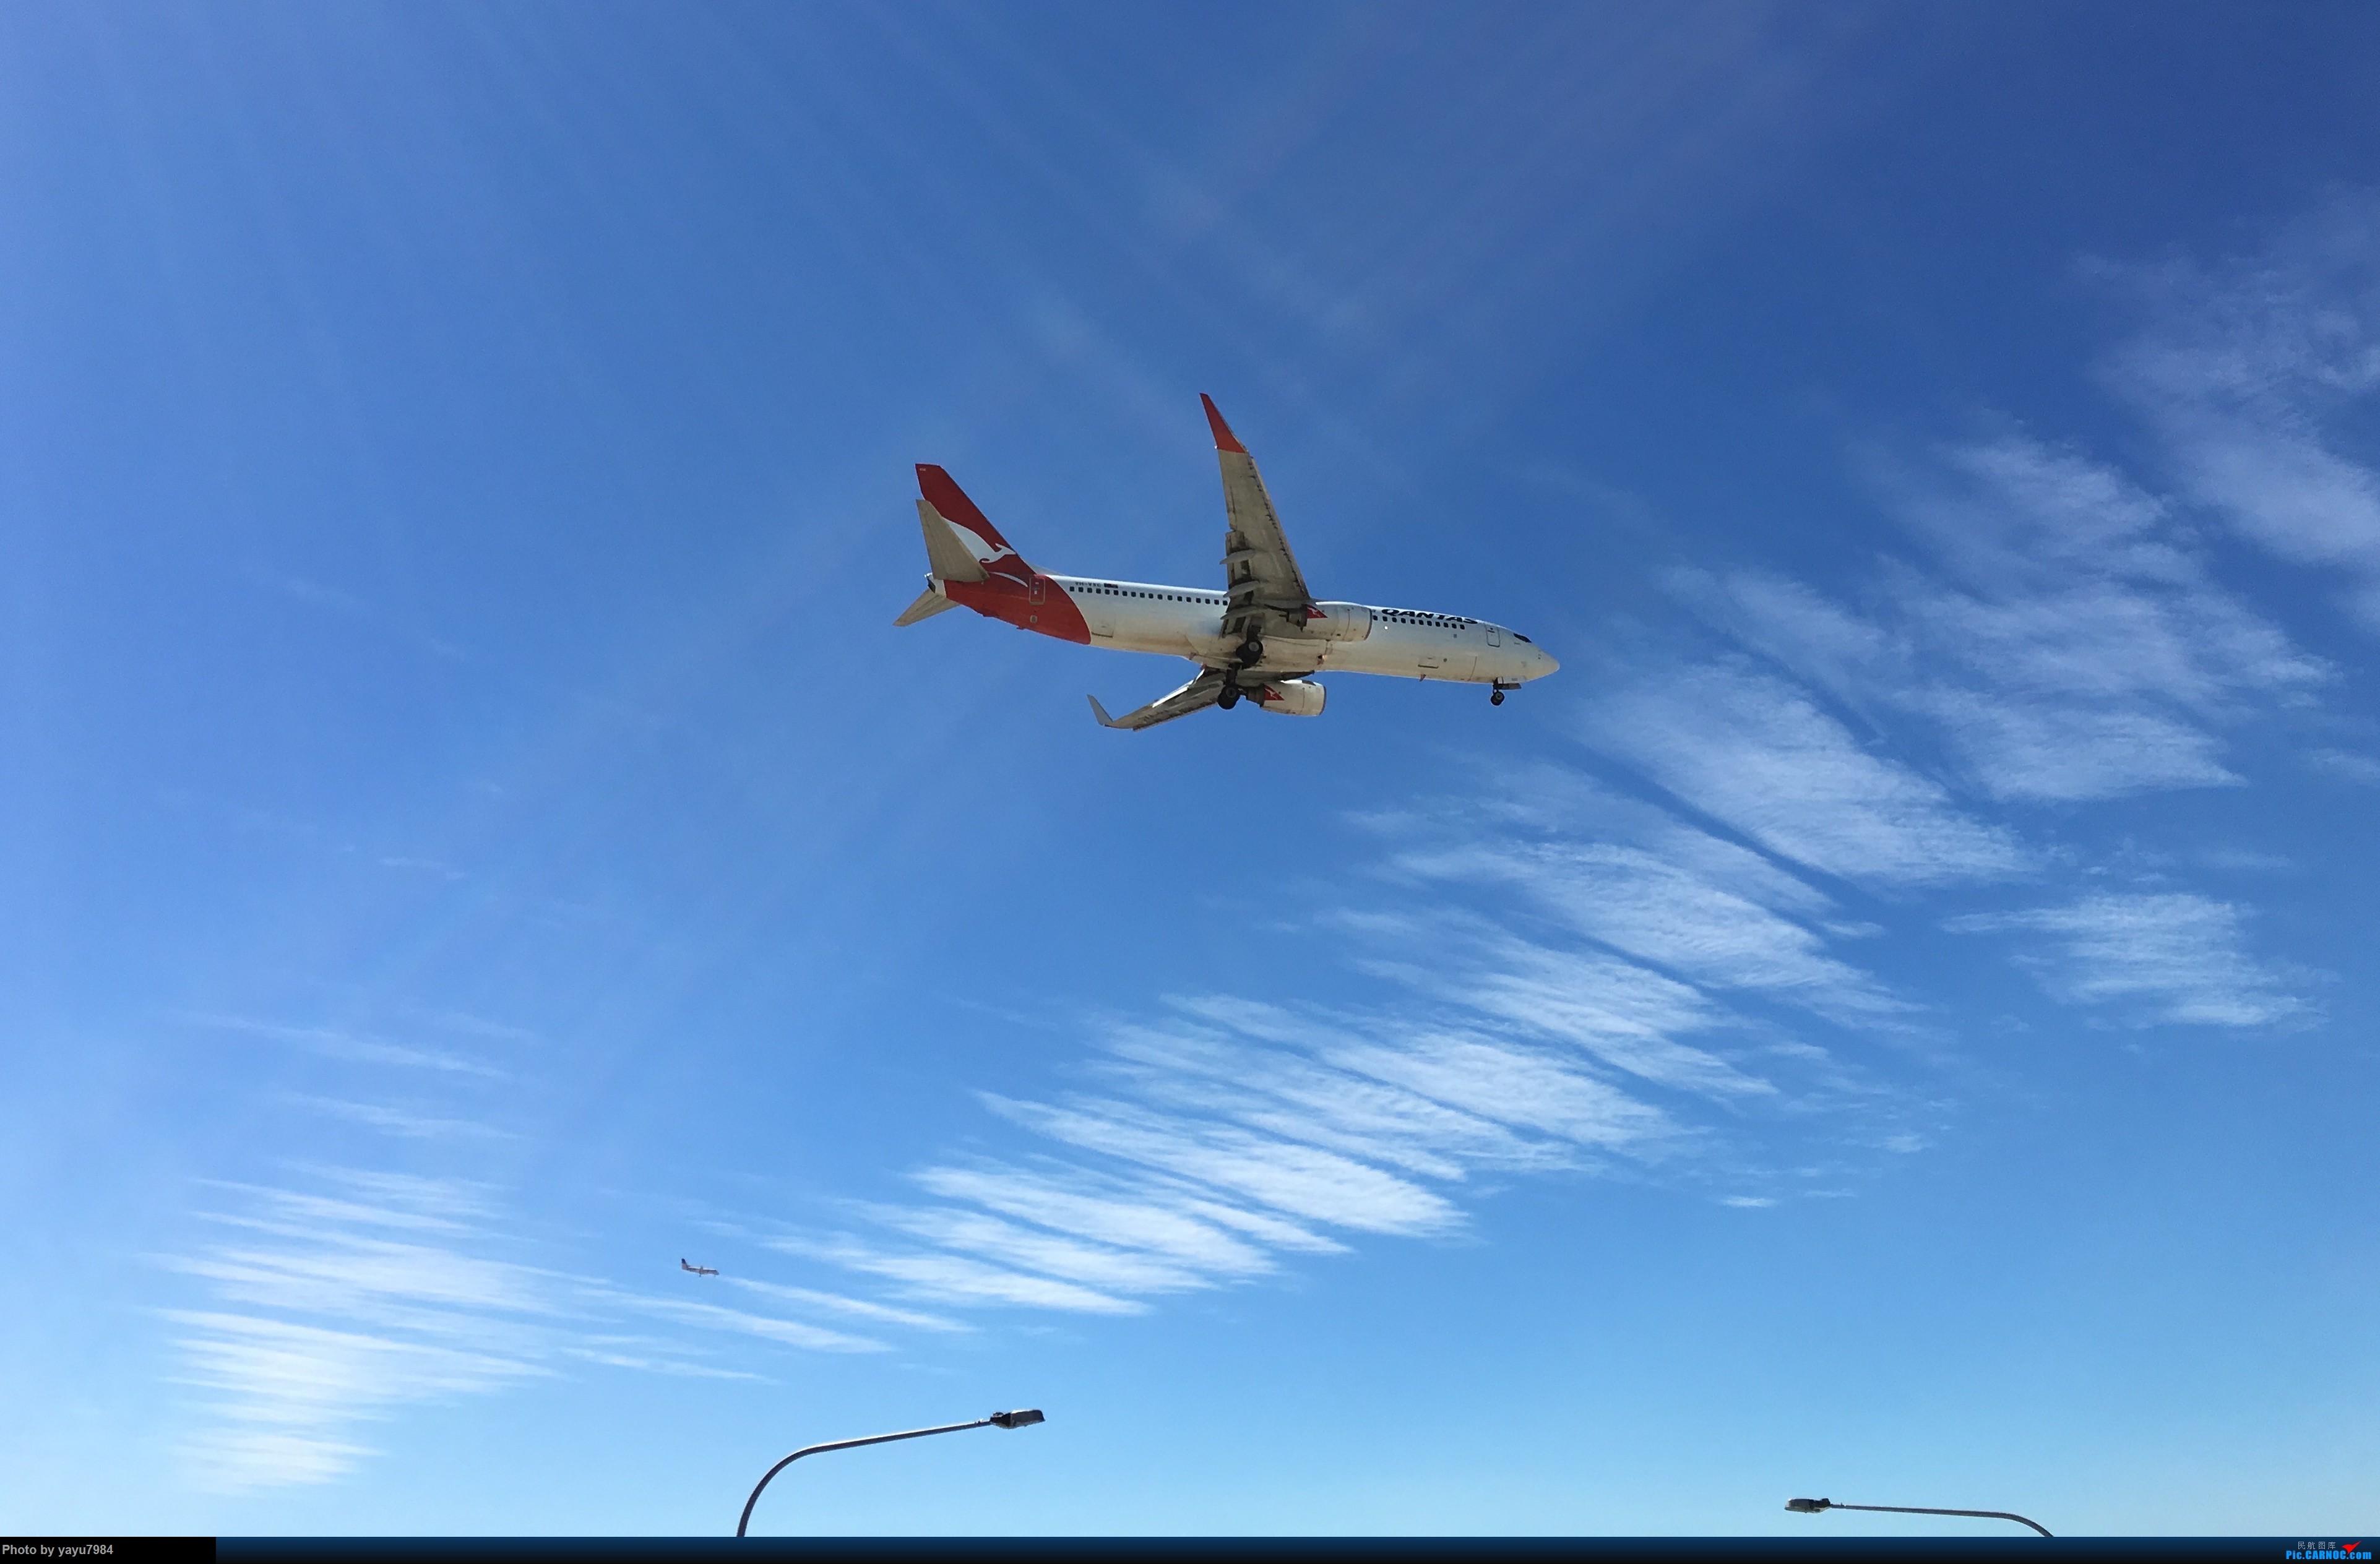 Re:[原创][SYD] 久违的南向起降,纪录16R拍机之行 BOEING 737-800 VH-VXC 澳大利亚悉尼金斯福德·史密斯机场